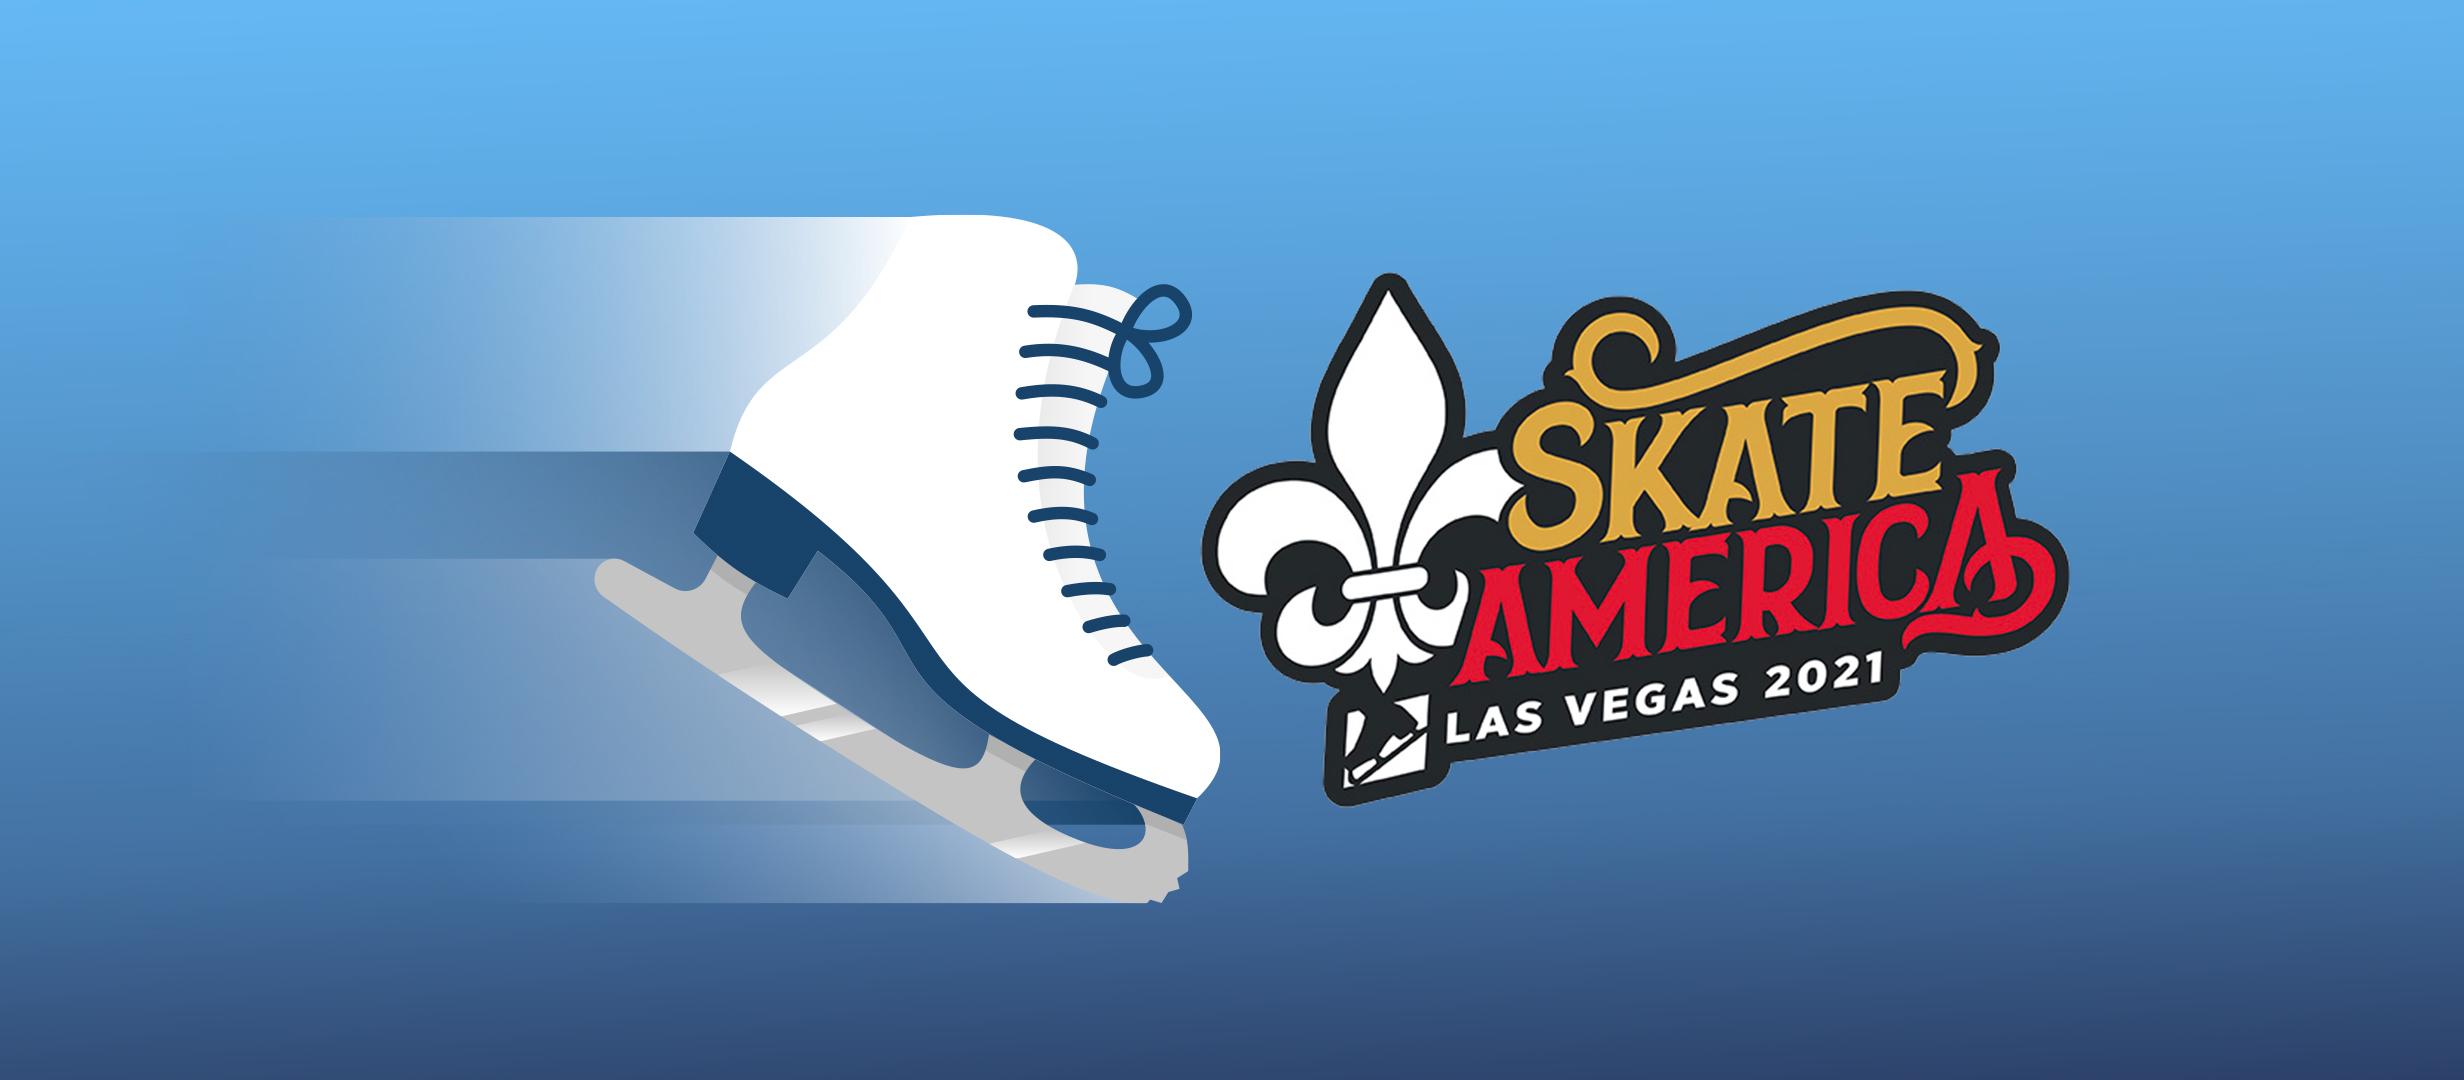 Skate America-2021: ставки на прыжки Трусовой на Гран-при США